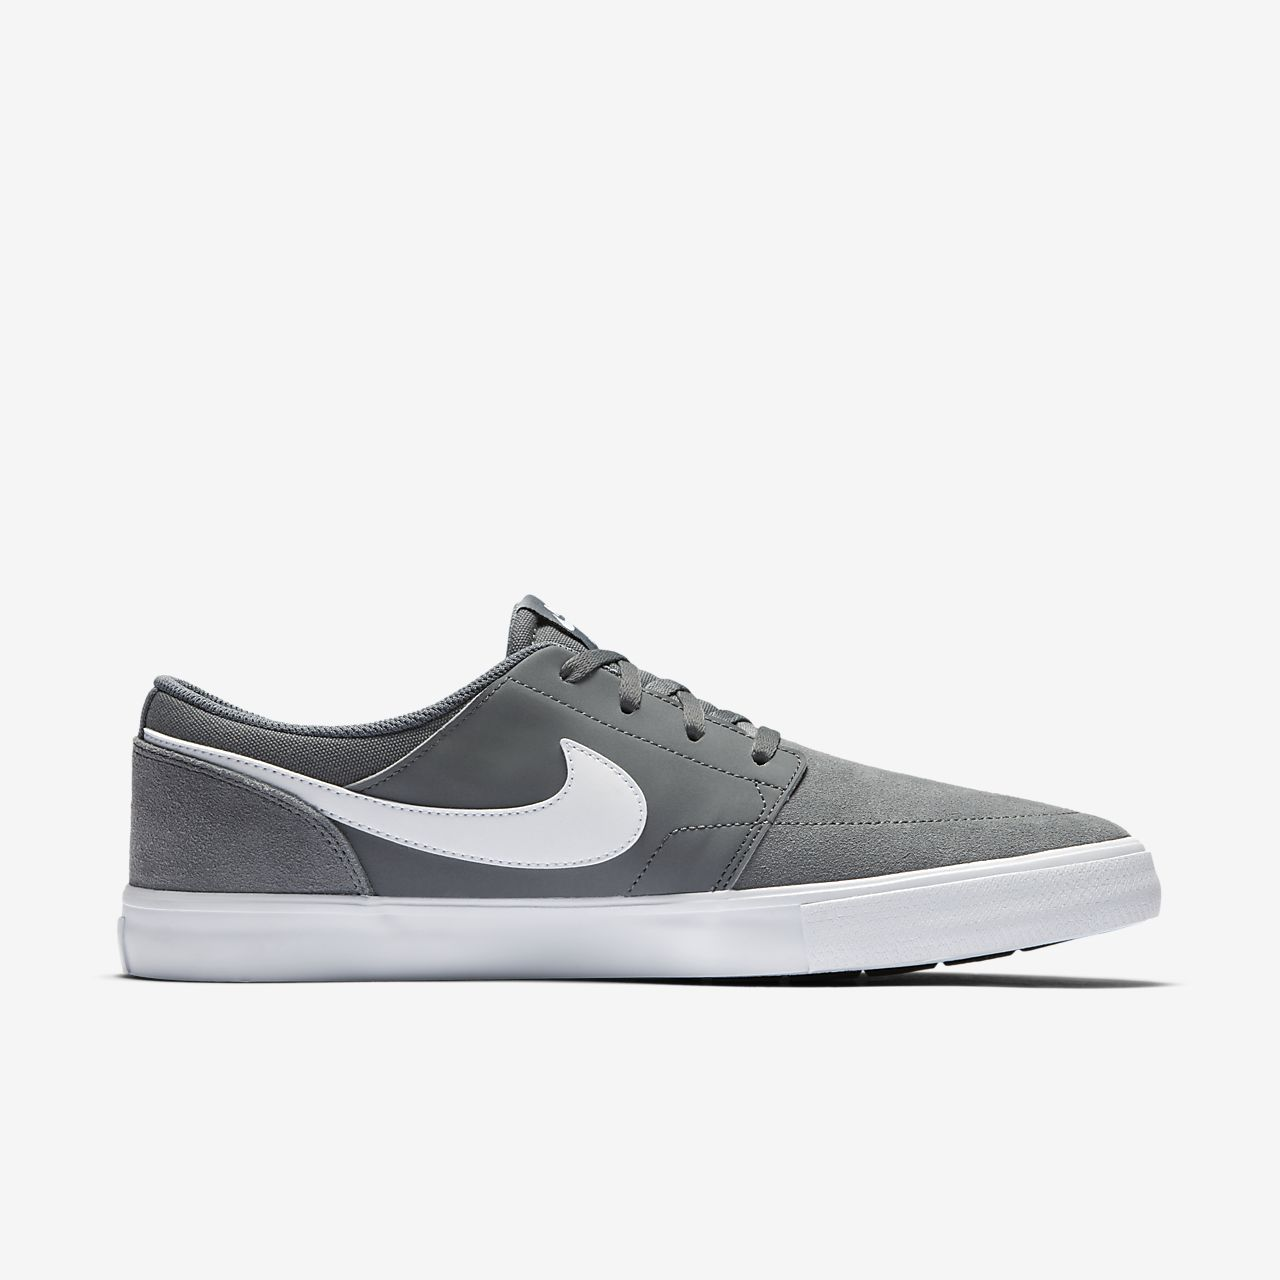 ... Nike SB Solarsoft Portmore II Men\u0027s Skateboarding Shoe